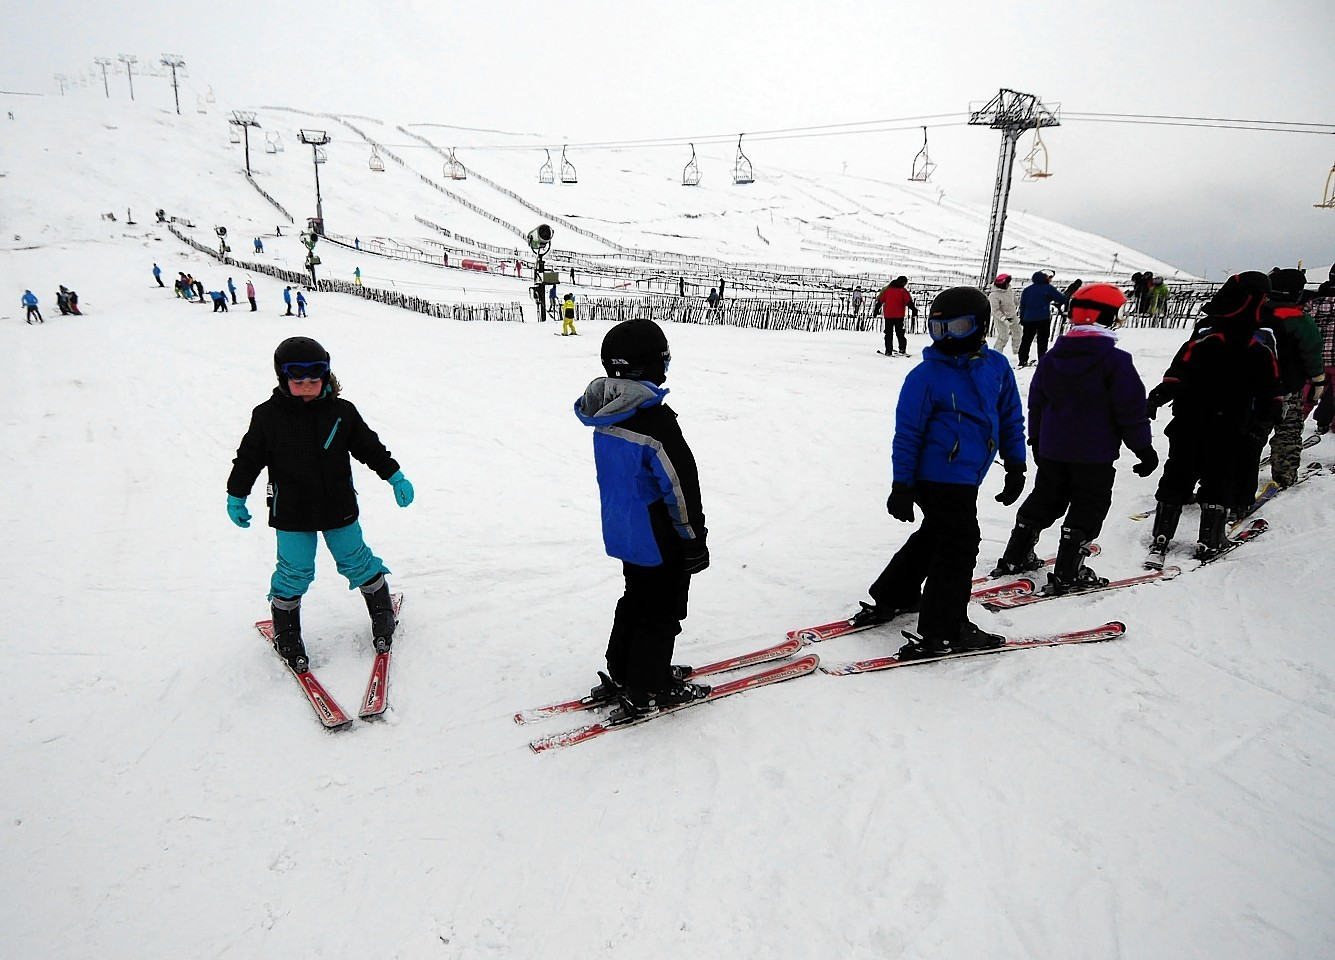 CairnGorm skiers